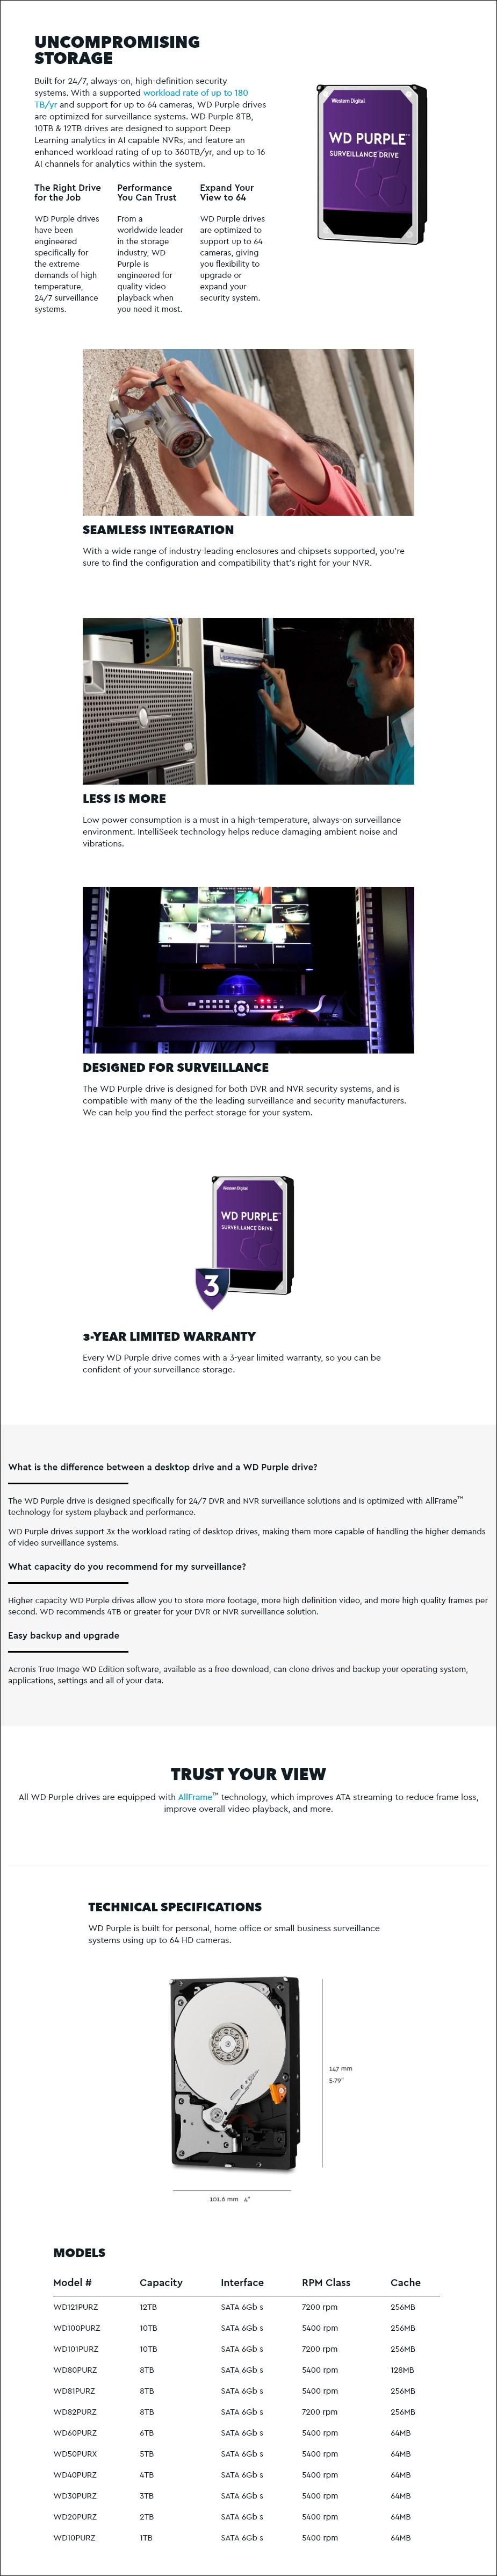 "WD WD82PURZ 8TB Purple 3.5"" SATA3 Surveillance Hard Driv - Overview 1"